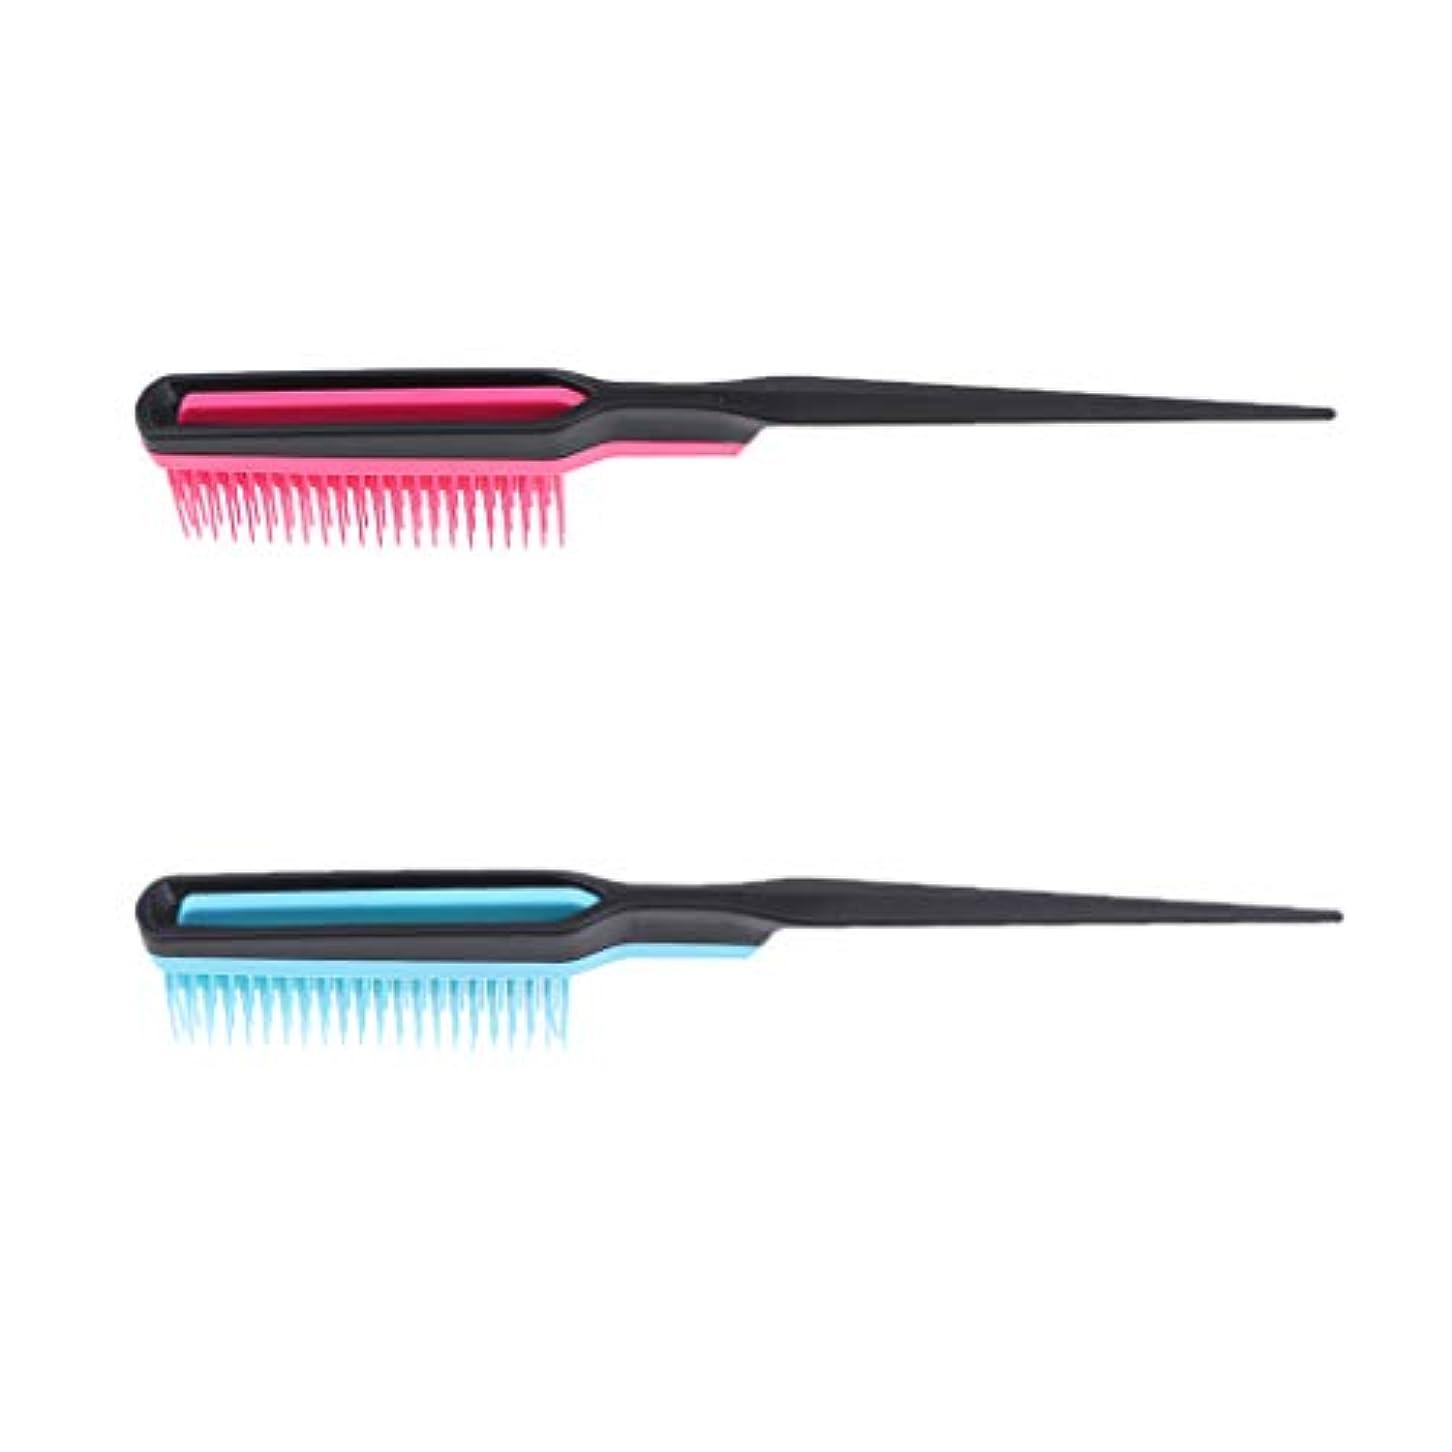 F Fityle 2個 ふわふわ 櫛 ナチュラル ヘアブラシ ヘアスタイリスト 理髪